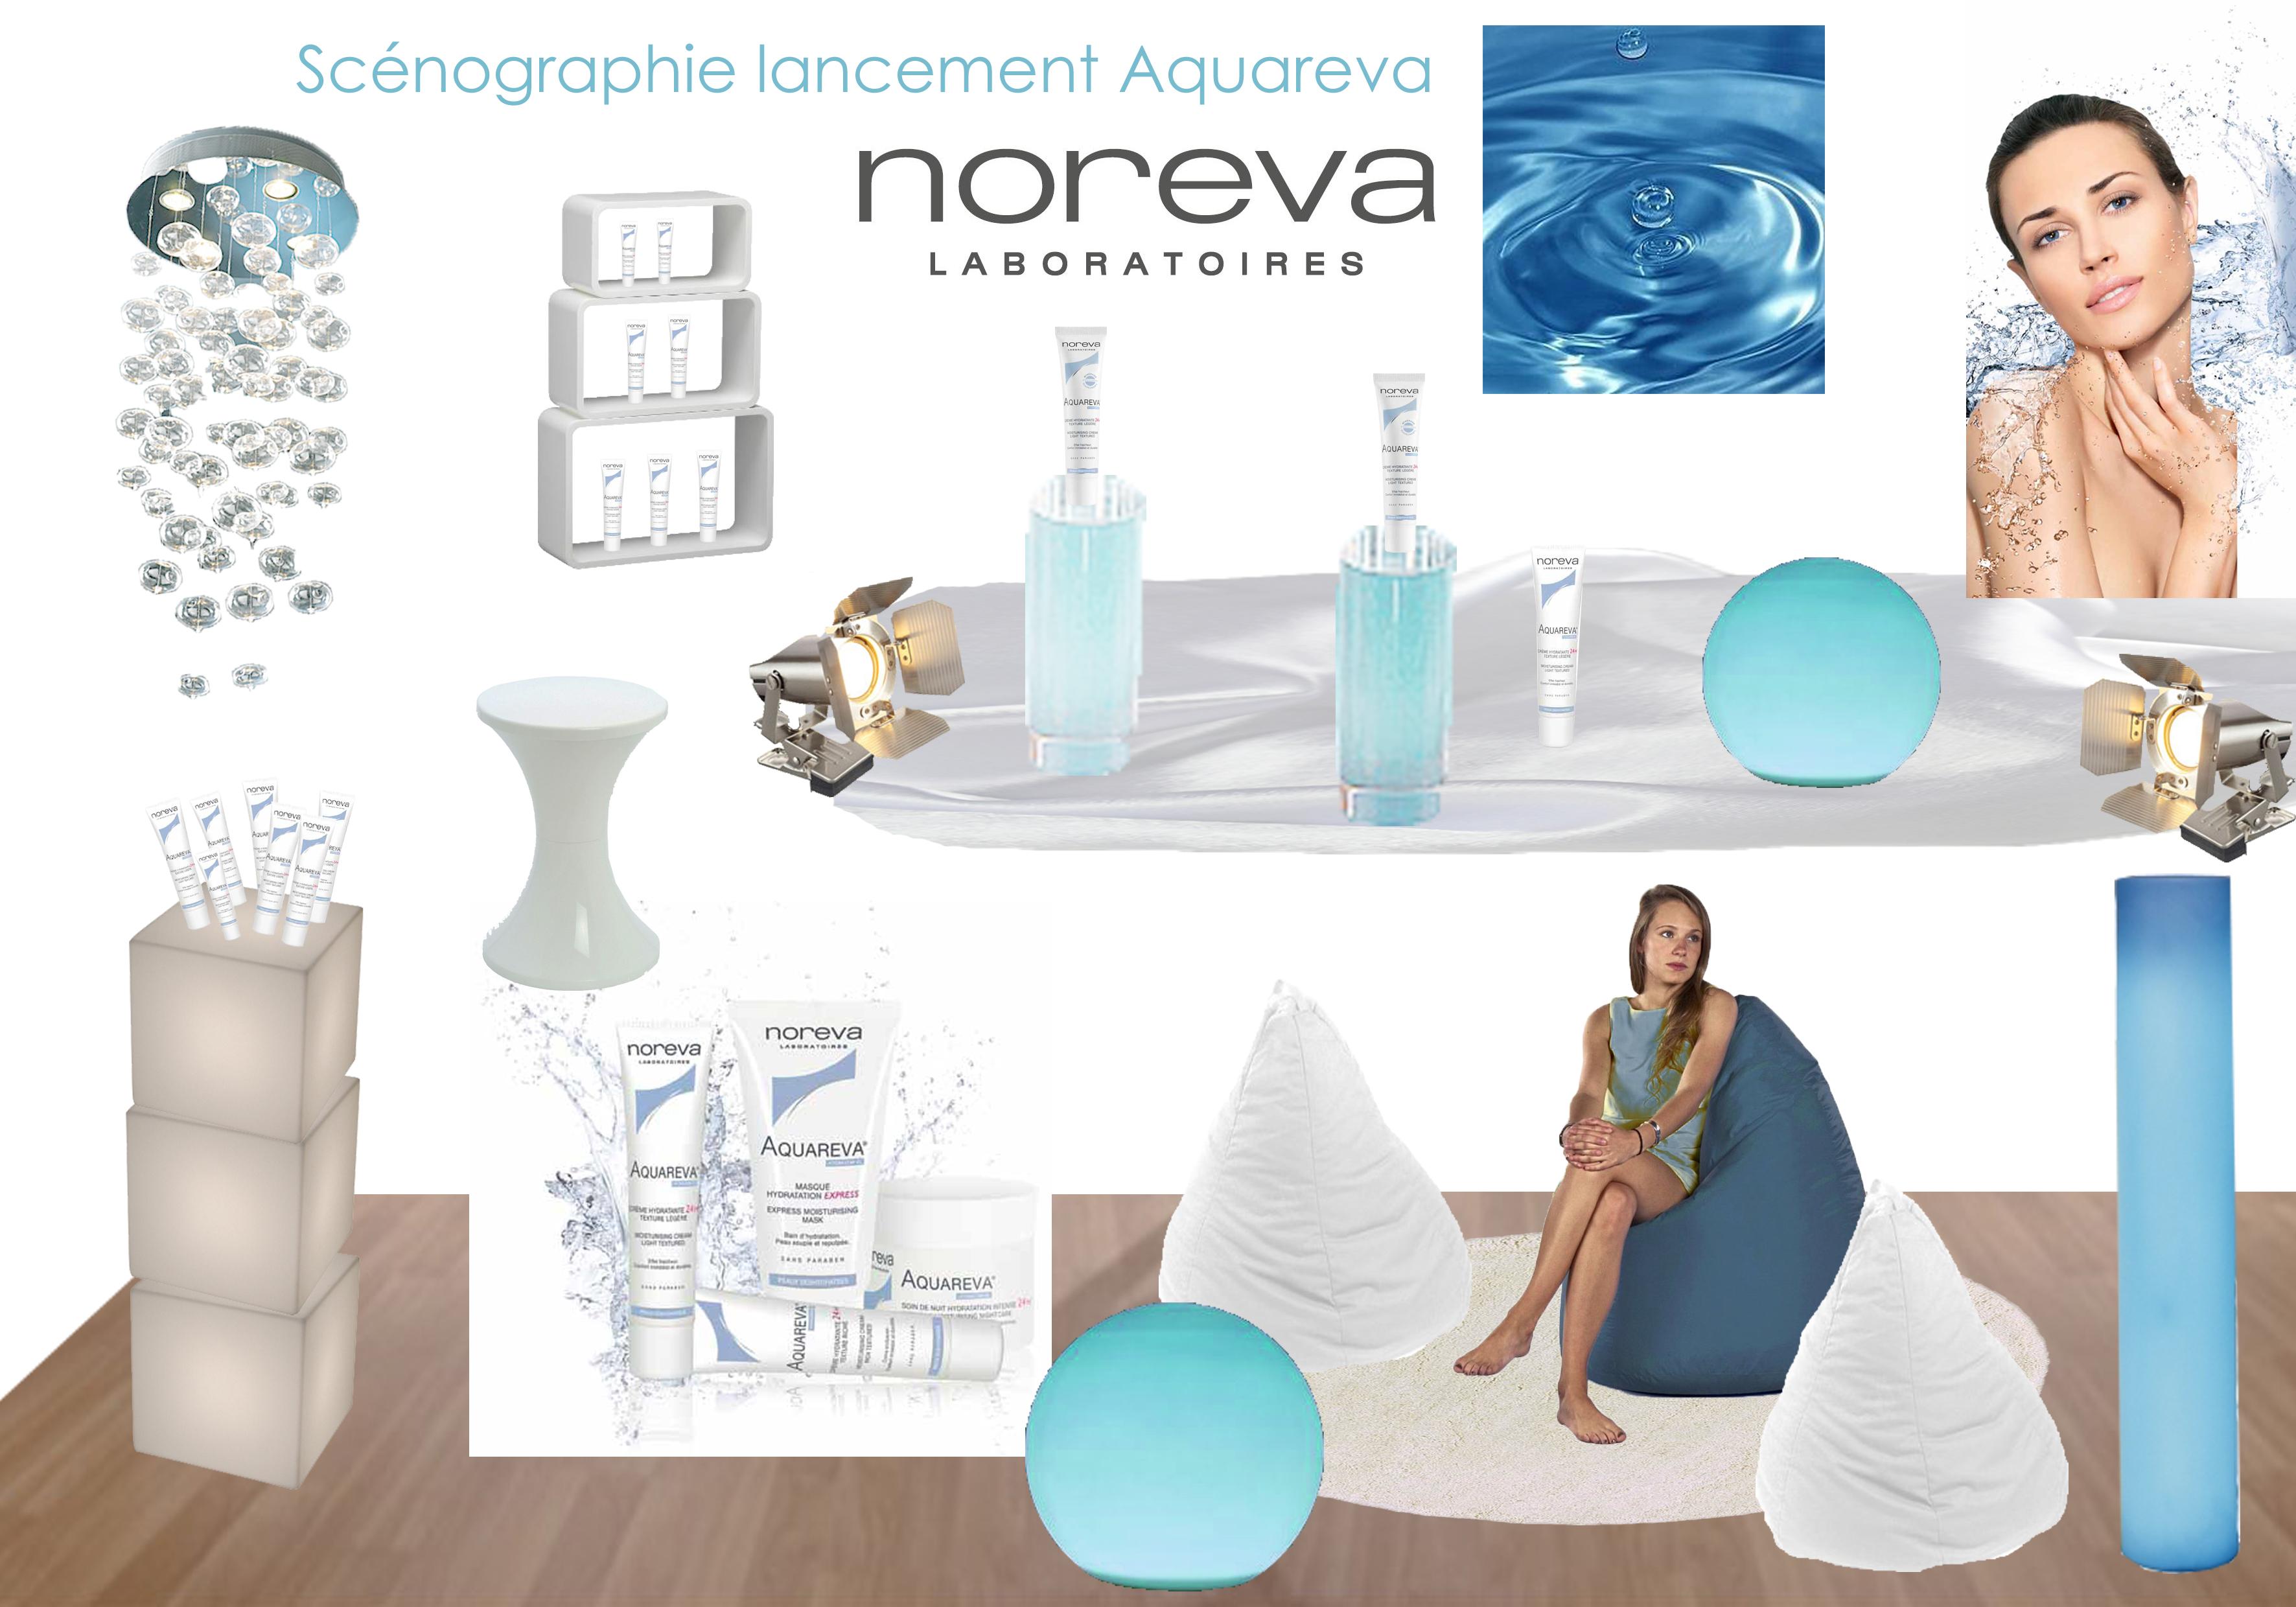 Planche projet lancement Aquareva Noreva